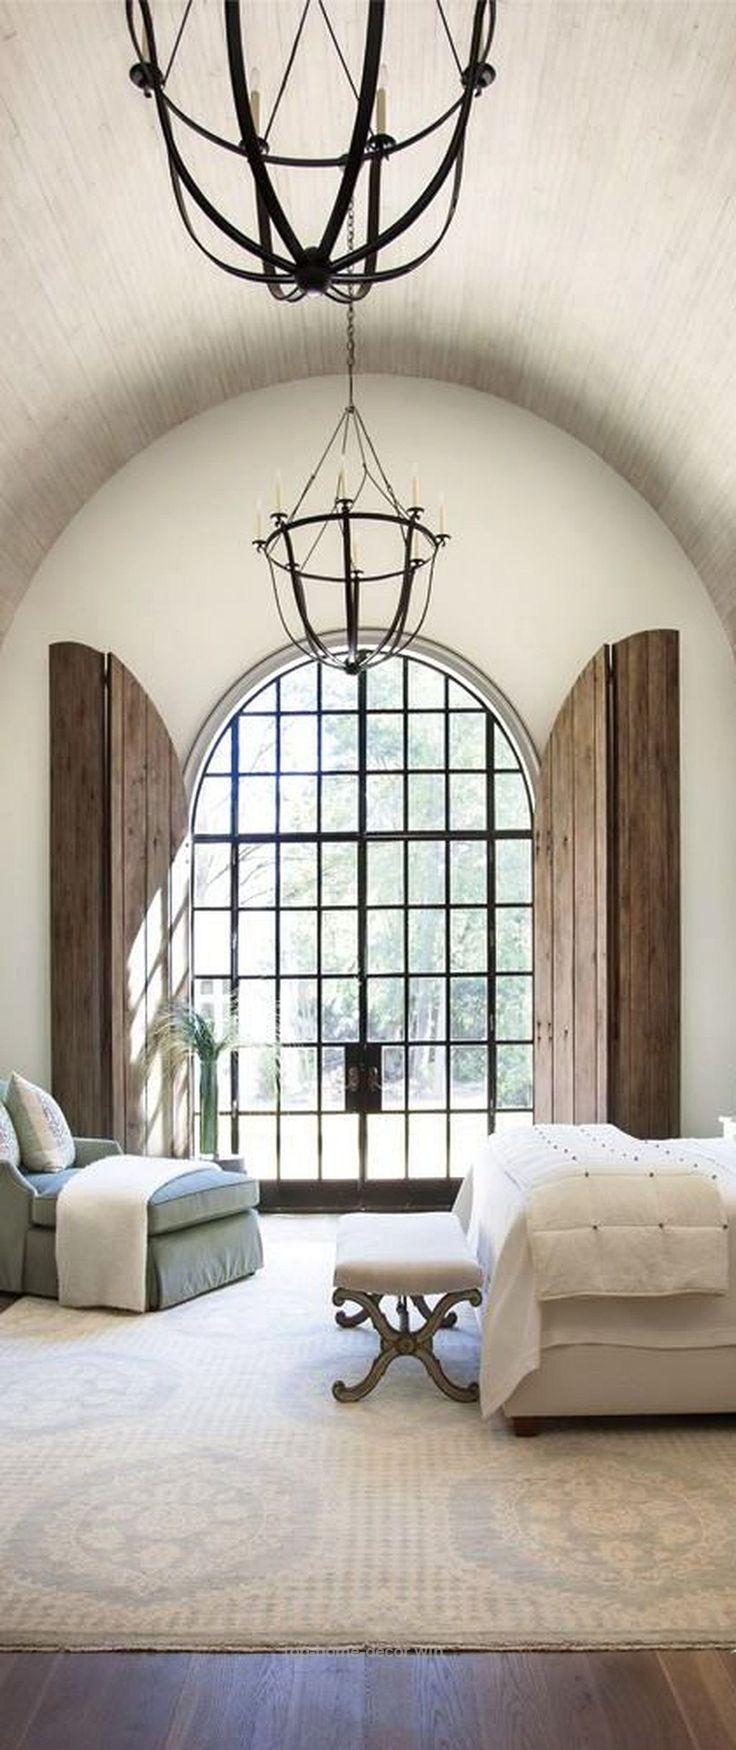 Splendid Stunning 100+ Mediterranean Home Decor Ideas Architecturemagzu2026.  The Post Stunning 100+ Mediterranean Home Decor Ideas Architecturemagzu2026u2026.  Appeared ...